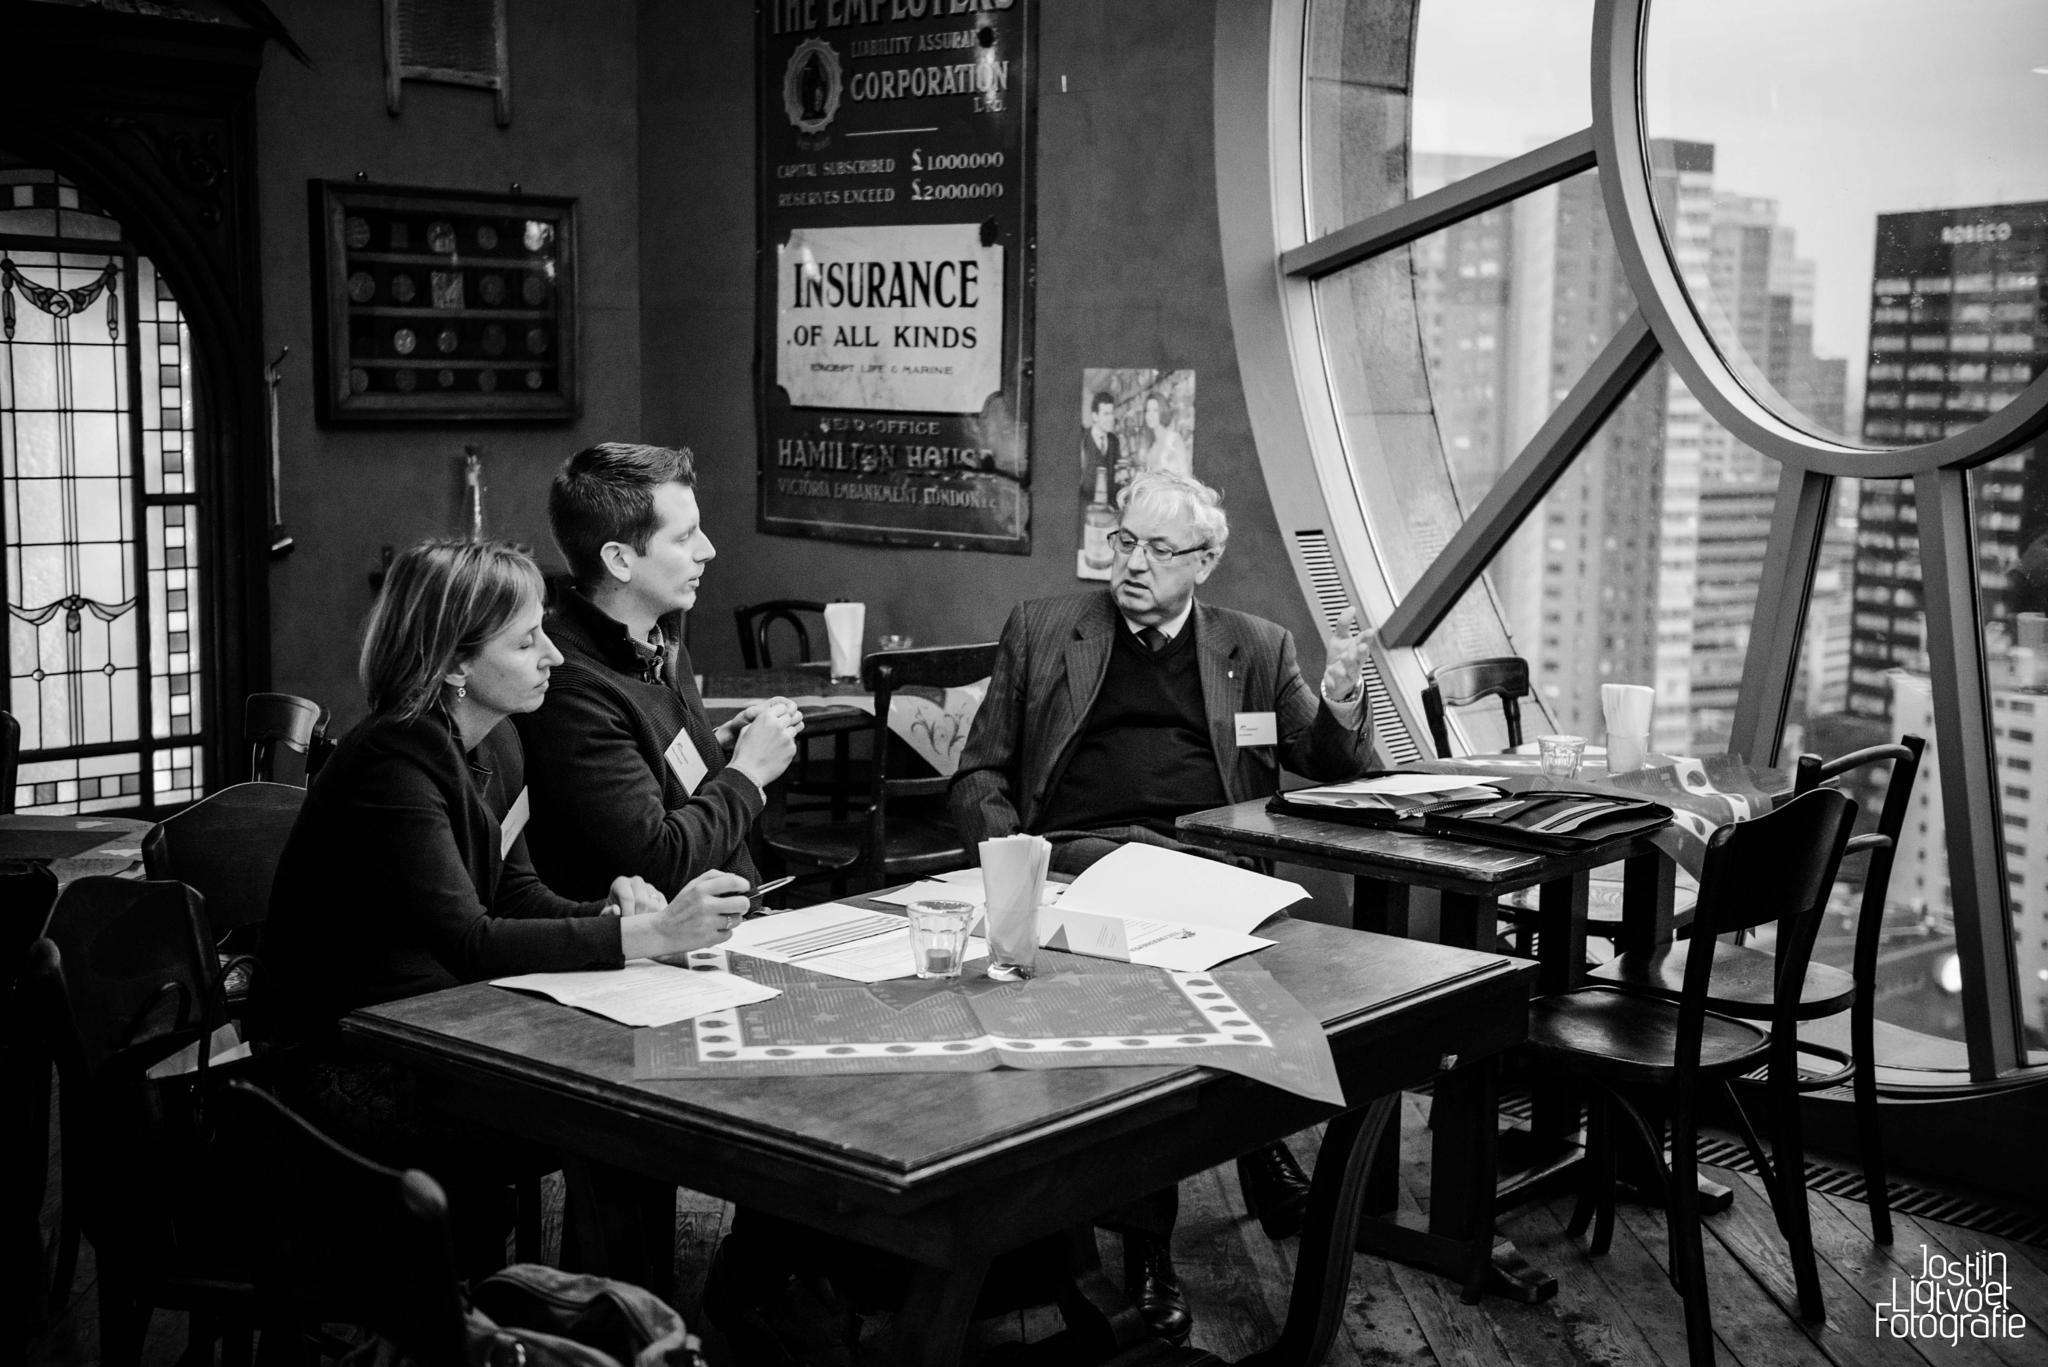 High altitude discussion by Jostijn Ligtvoet Fotografie